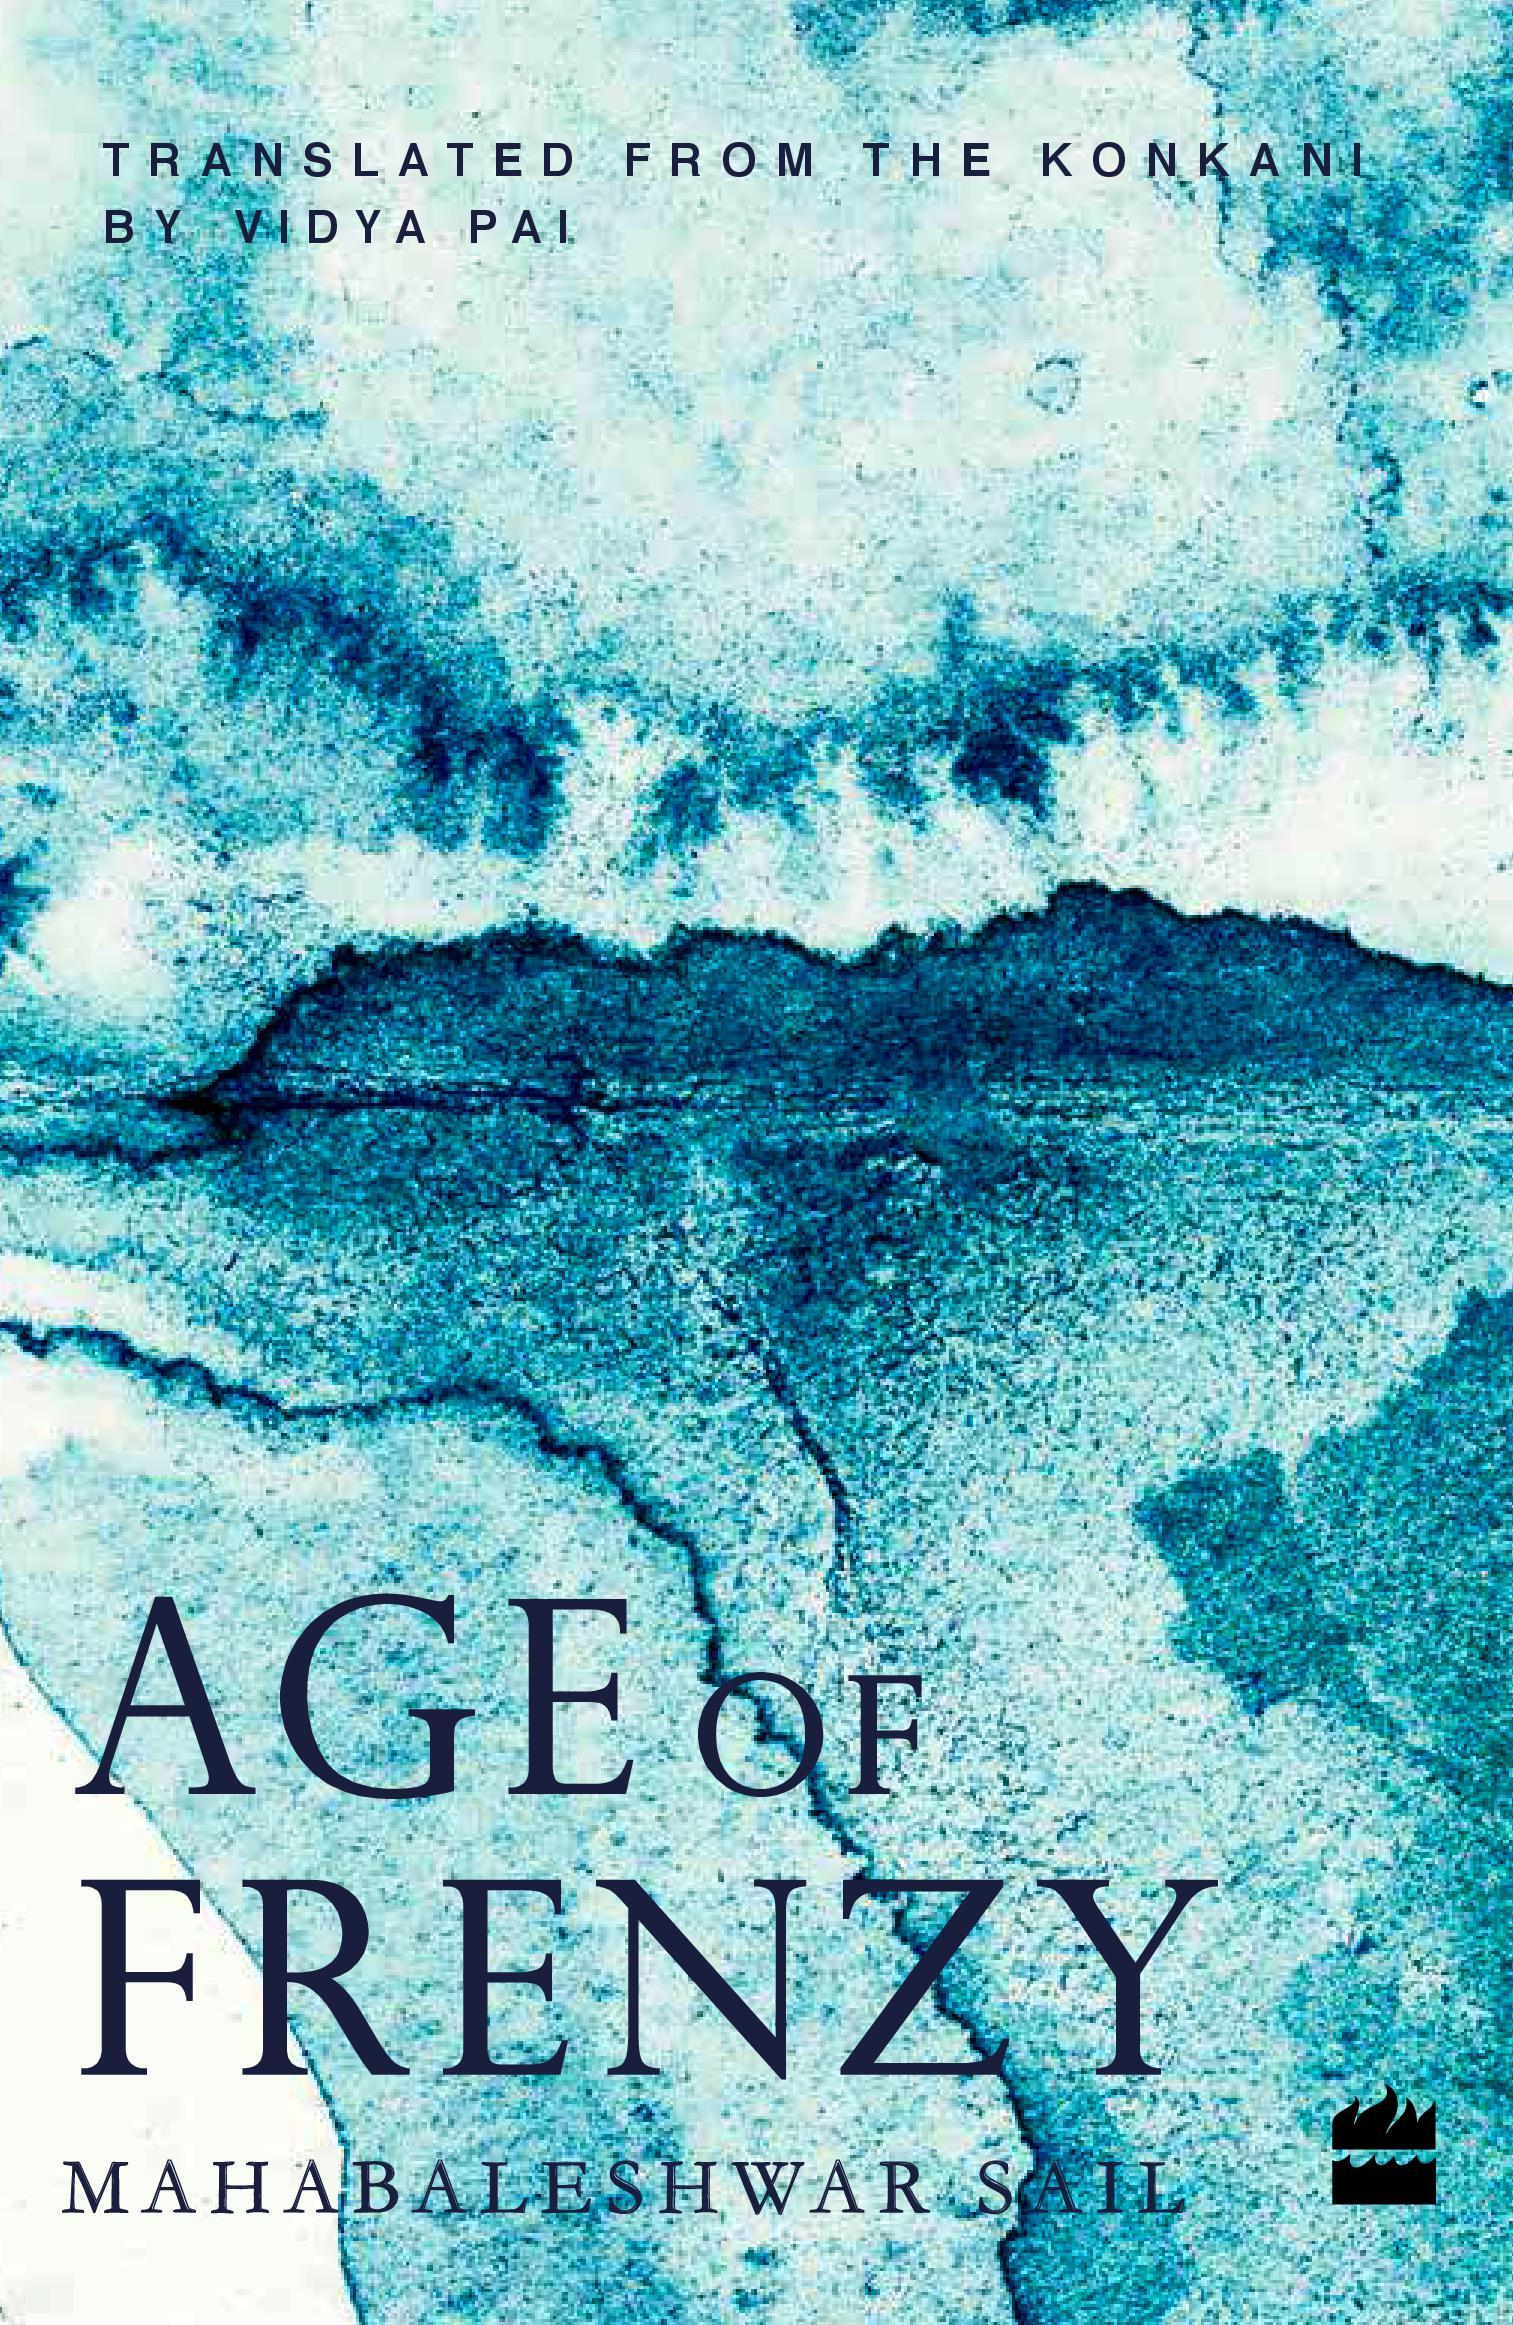 Mahabaleshwar Sail, translated by Vidya Pai <em>Age of Frenzy</em> Harper Collins, 2017